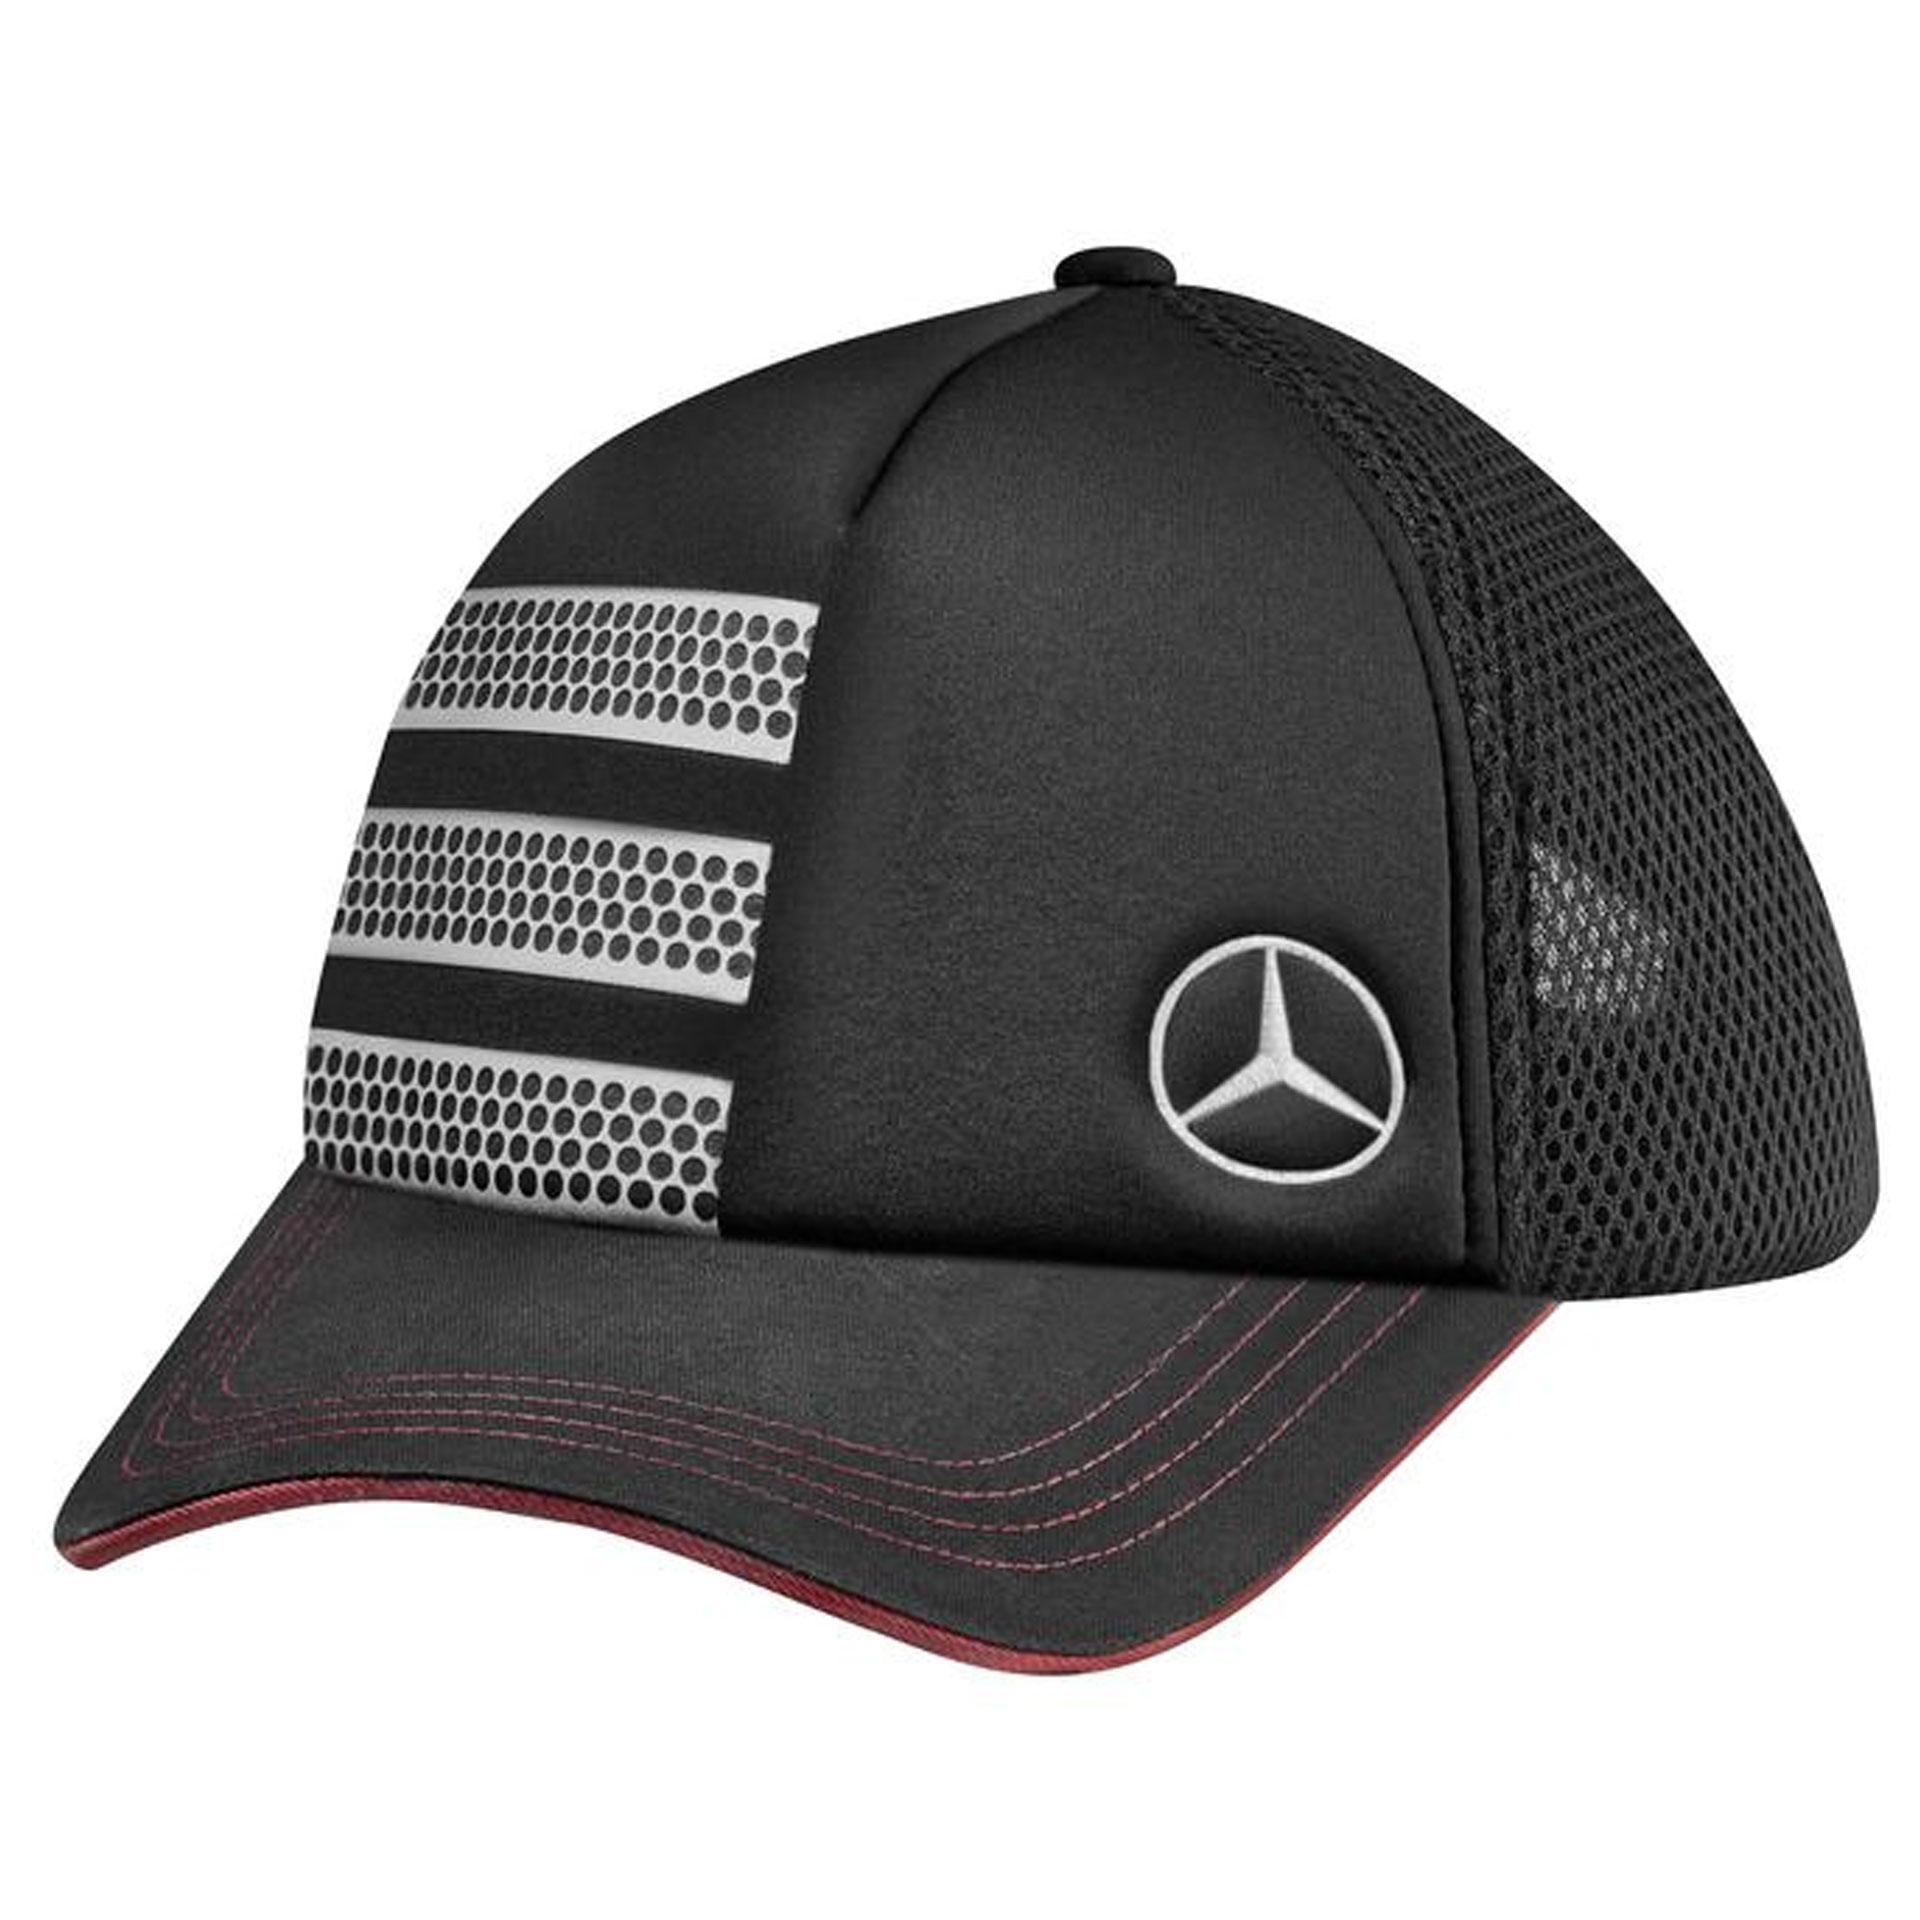 Mercedes-Benz Actros Cap Basecap schwarz